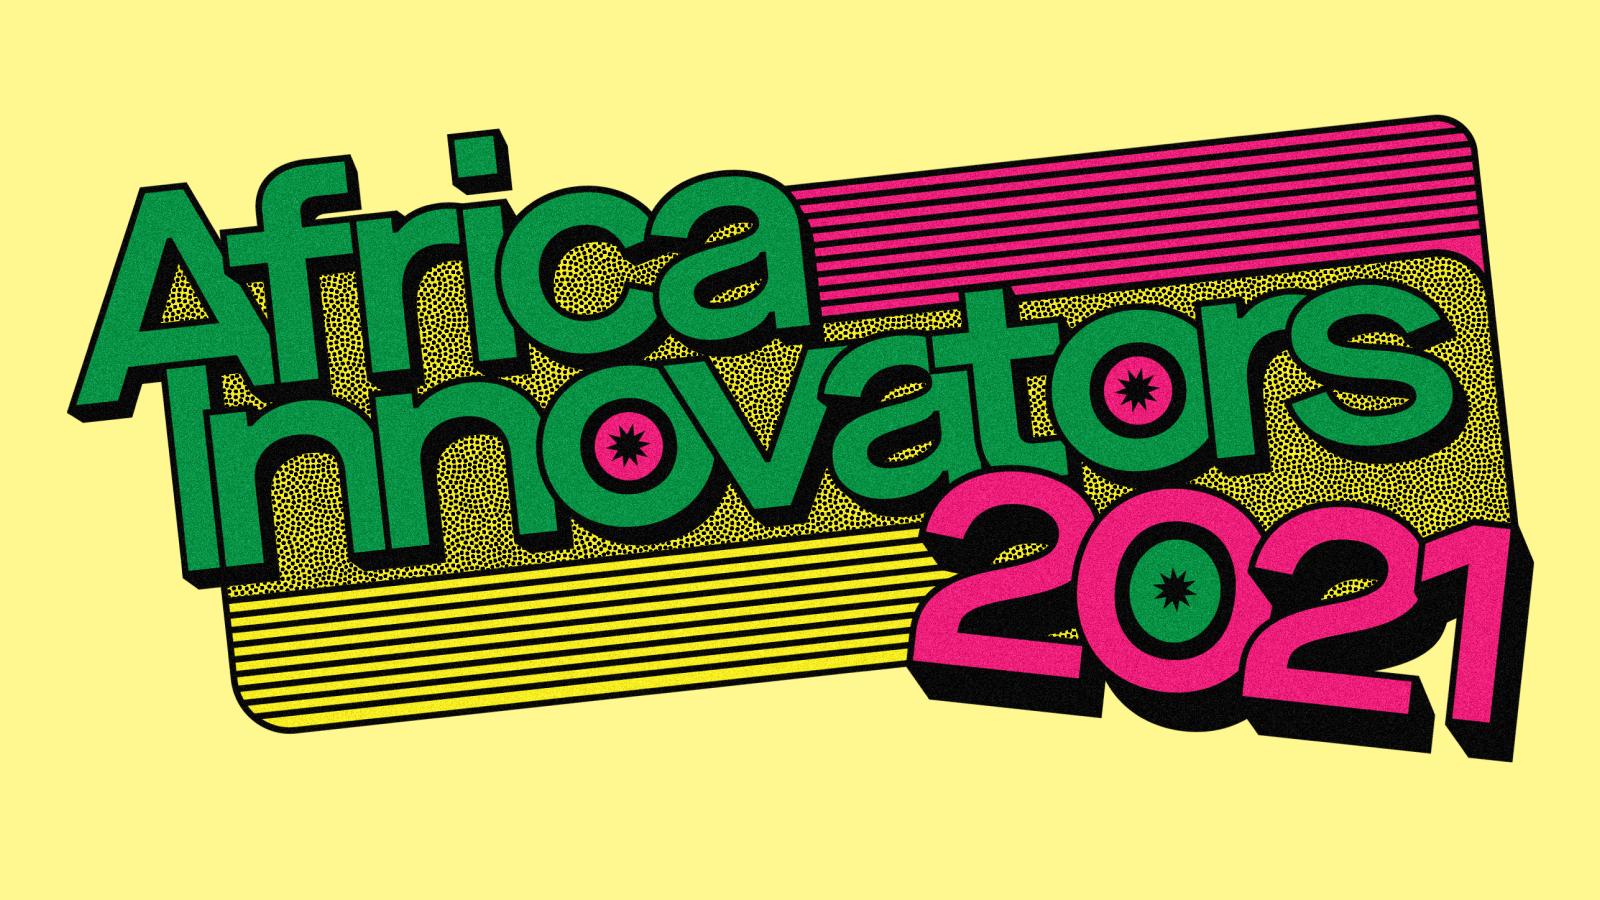 Africa innovators 2021 logo